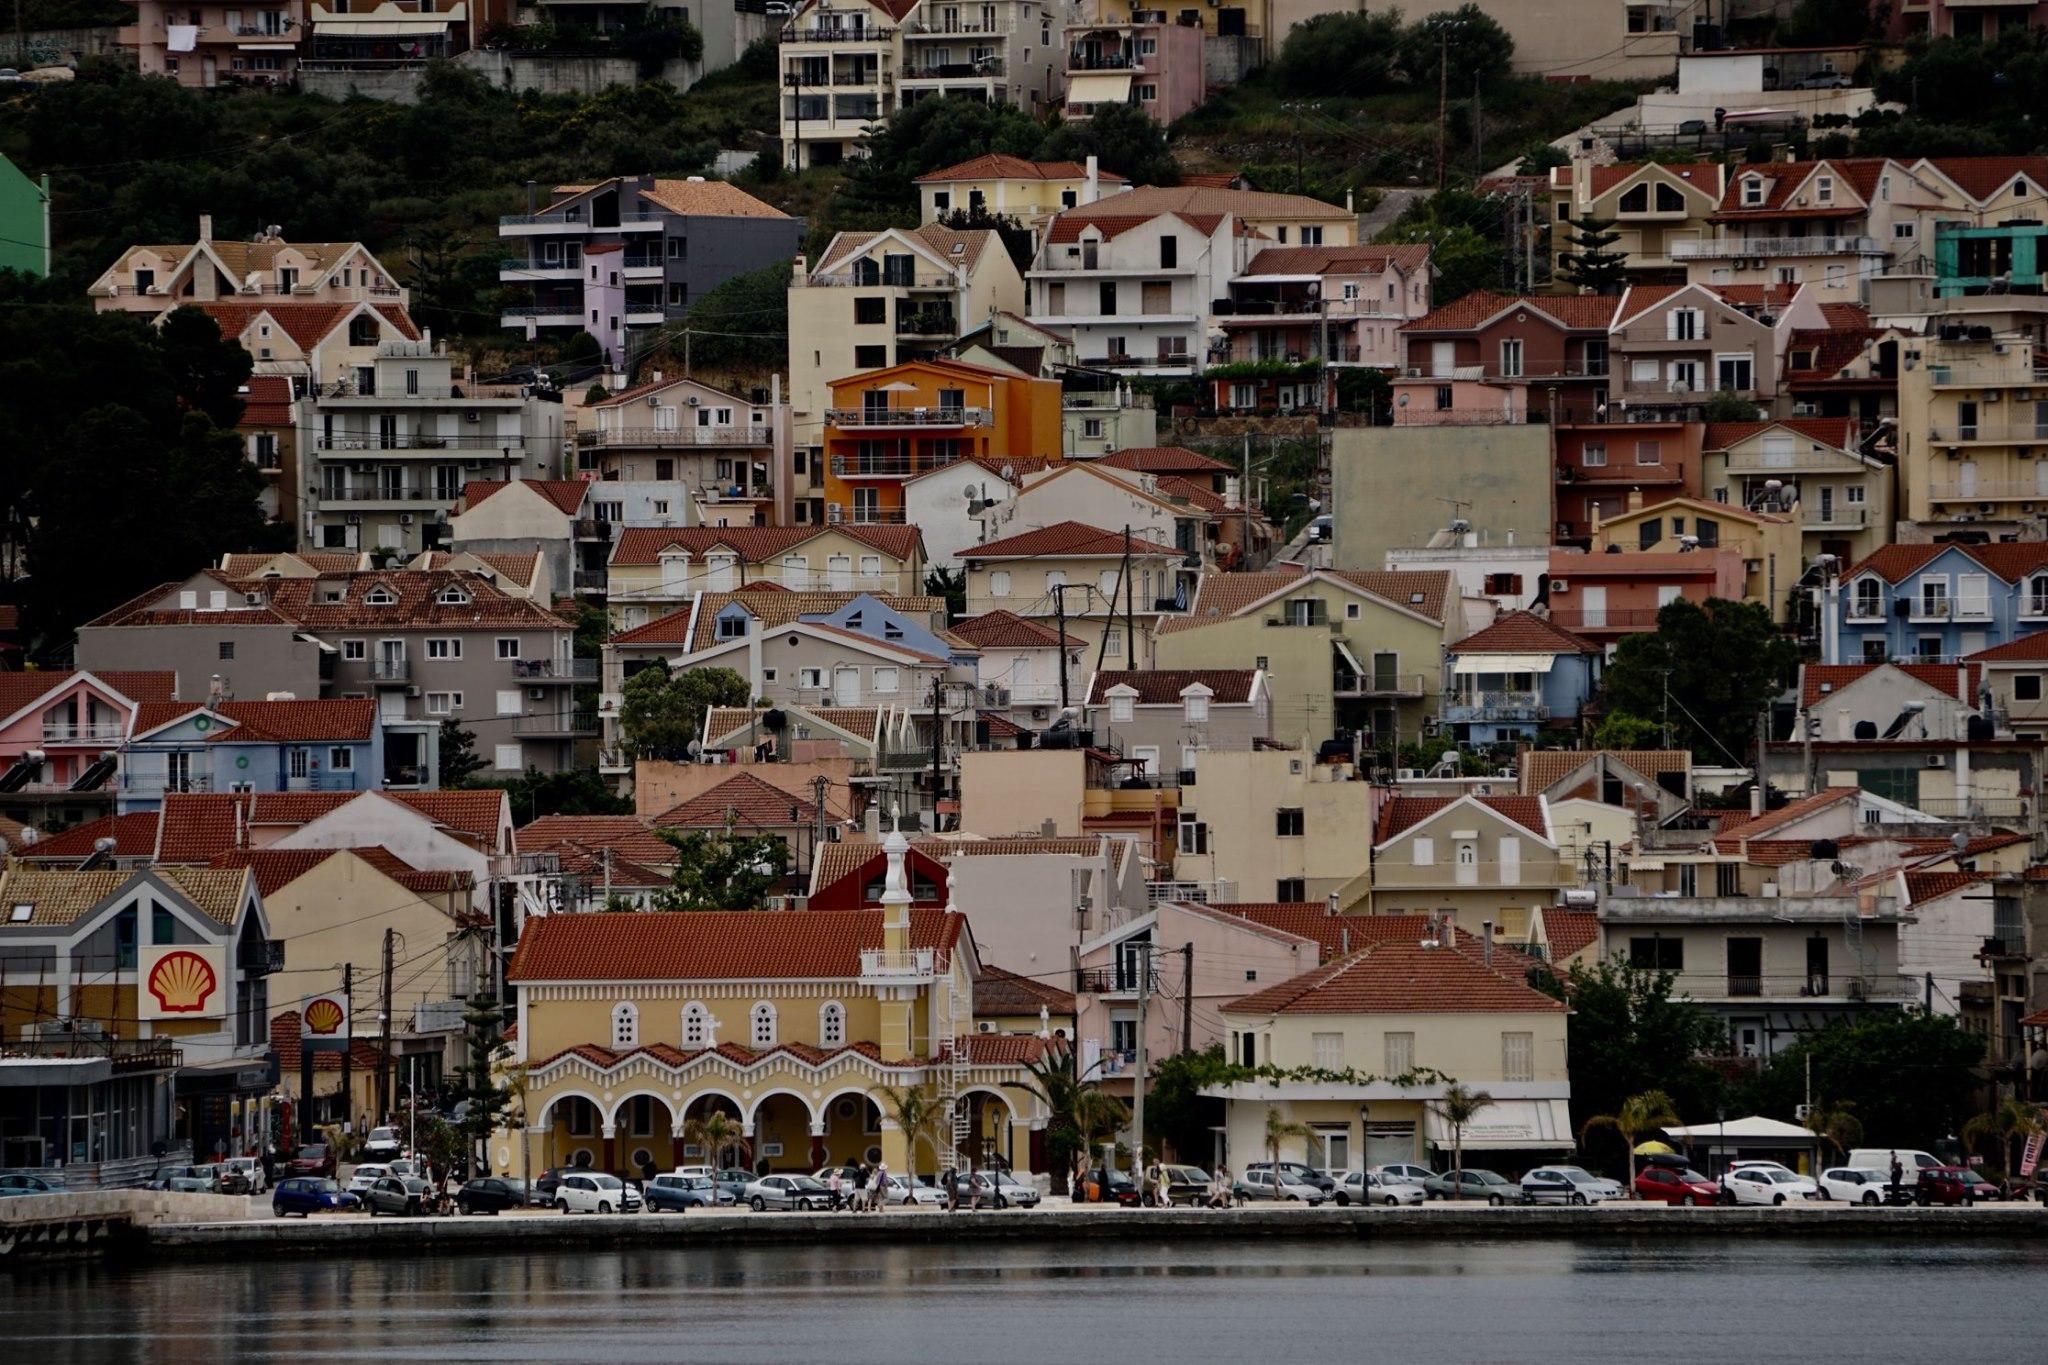 Aύξηση Δημοτικών Τελών στο Δήμο Αργοστολίου  Πληρώνουμε περισσότερα τέλη απο δήμους της Αθήνας  Δείτε παραδείγματα